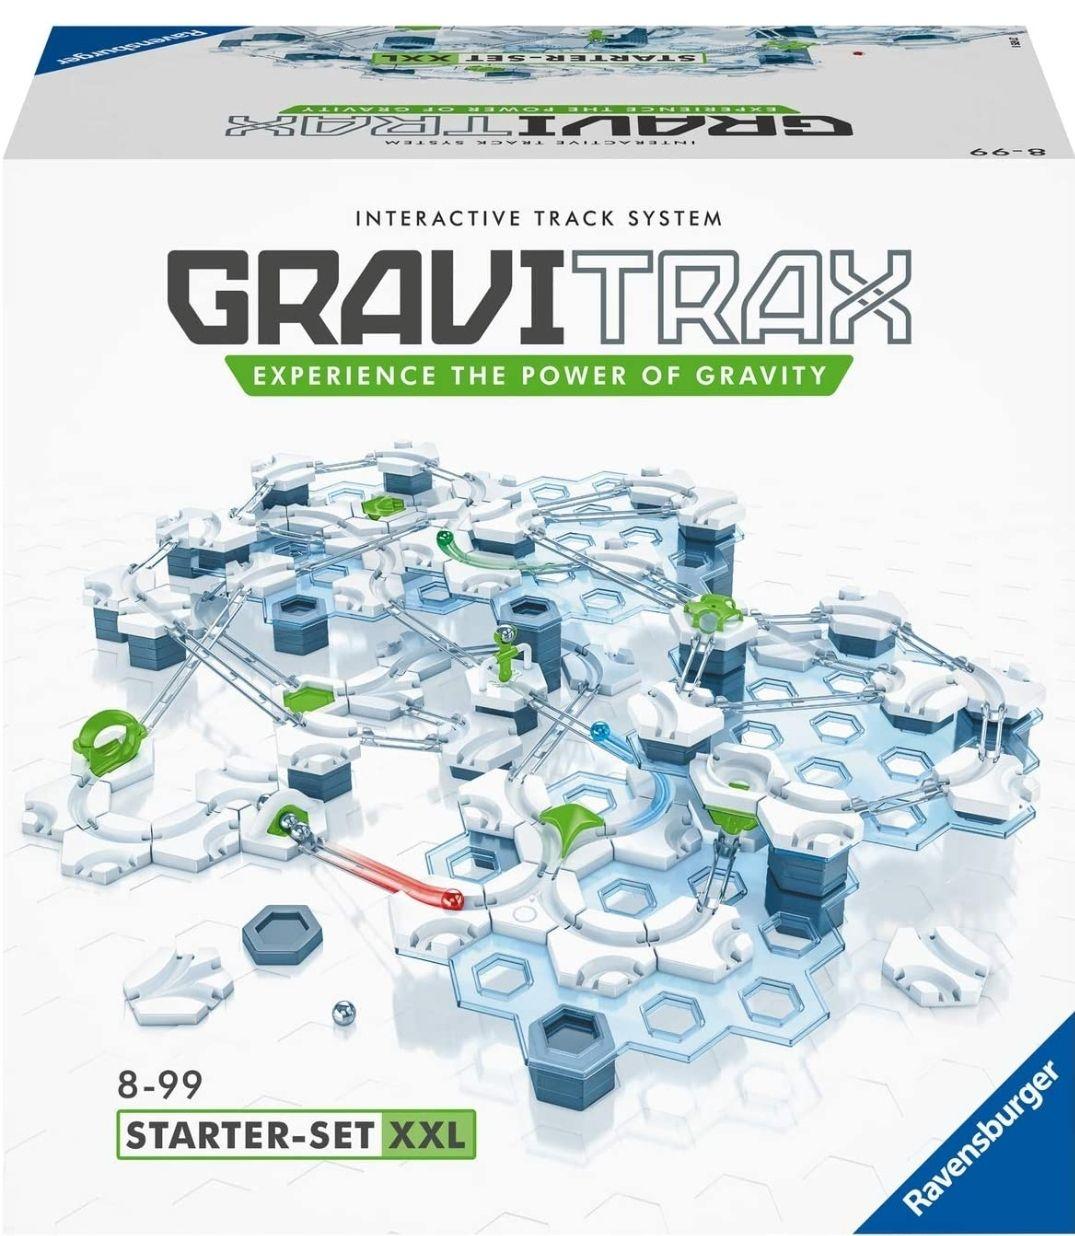 Kit de démarrage Gravitrax Starter Set XXL